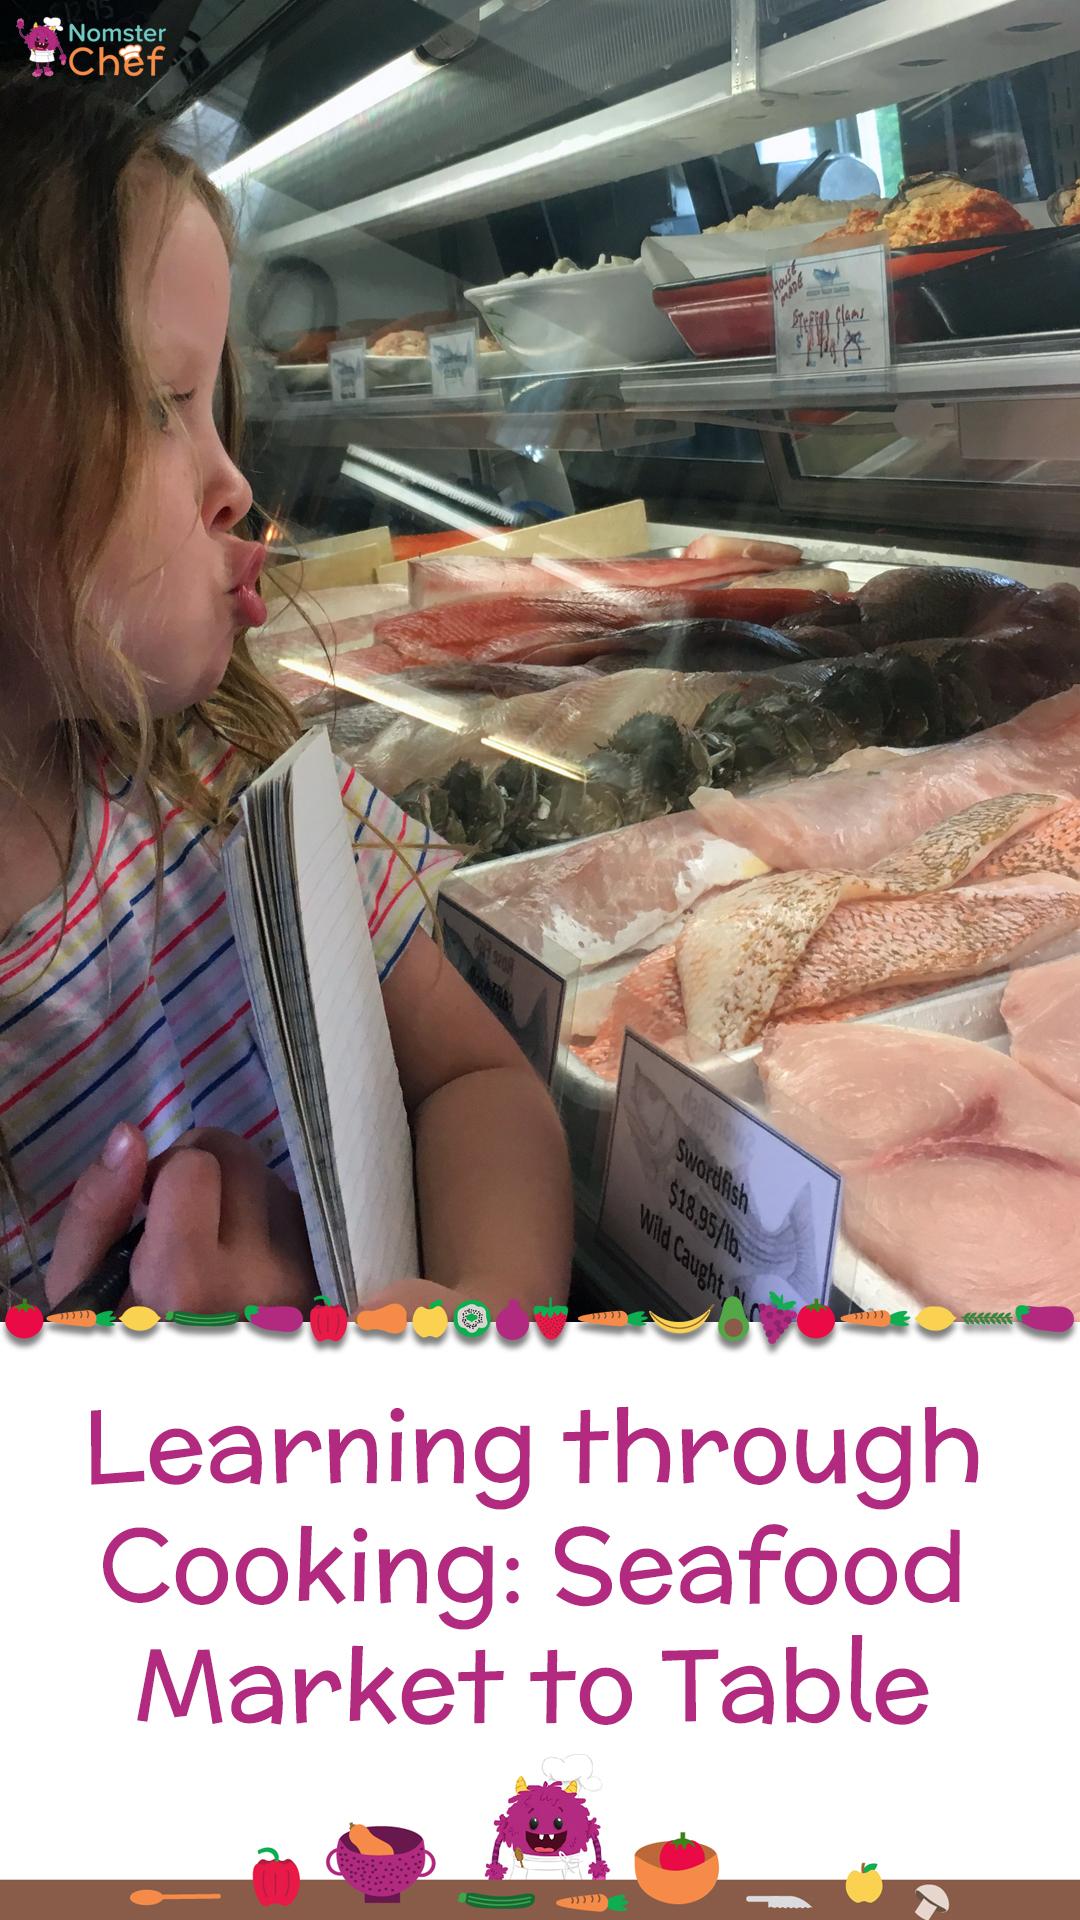 NomsterChef_LearningThroughCooking_SeafoodMarkettoTable_PinterestImage.jpg